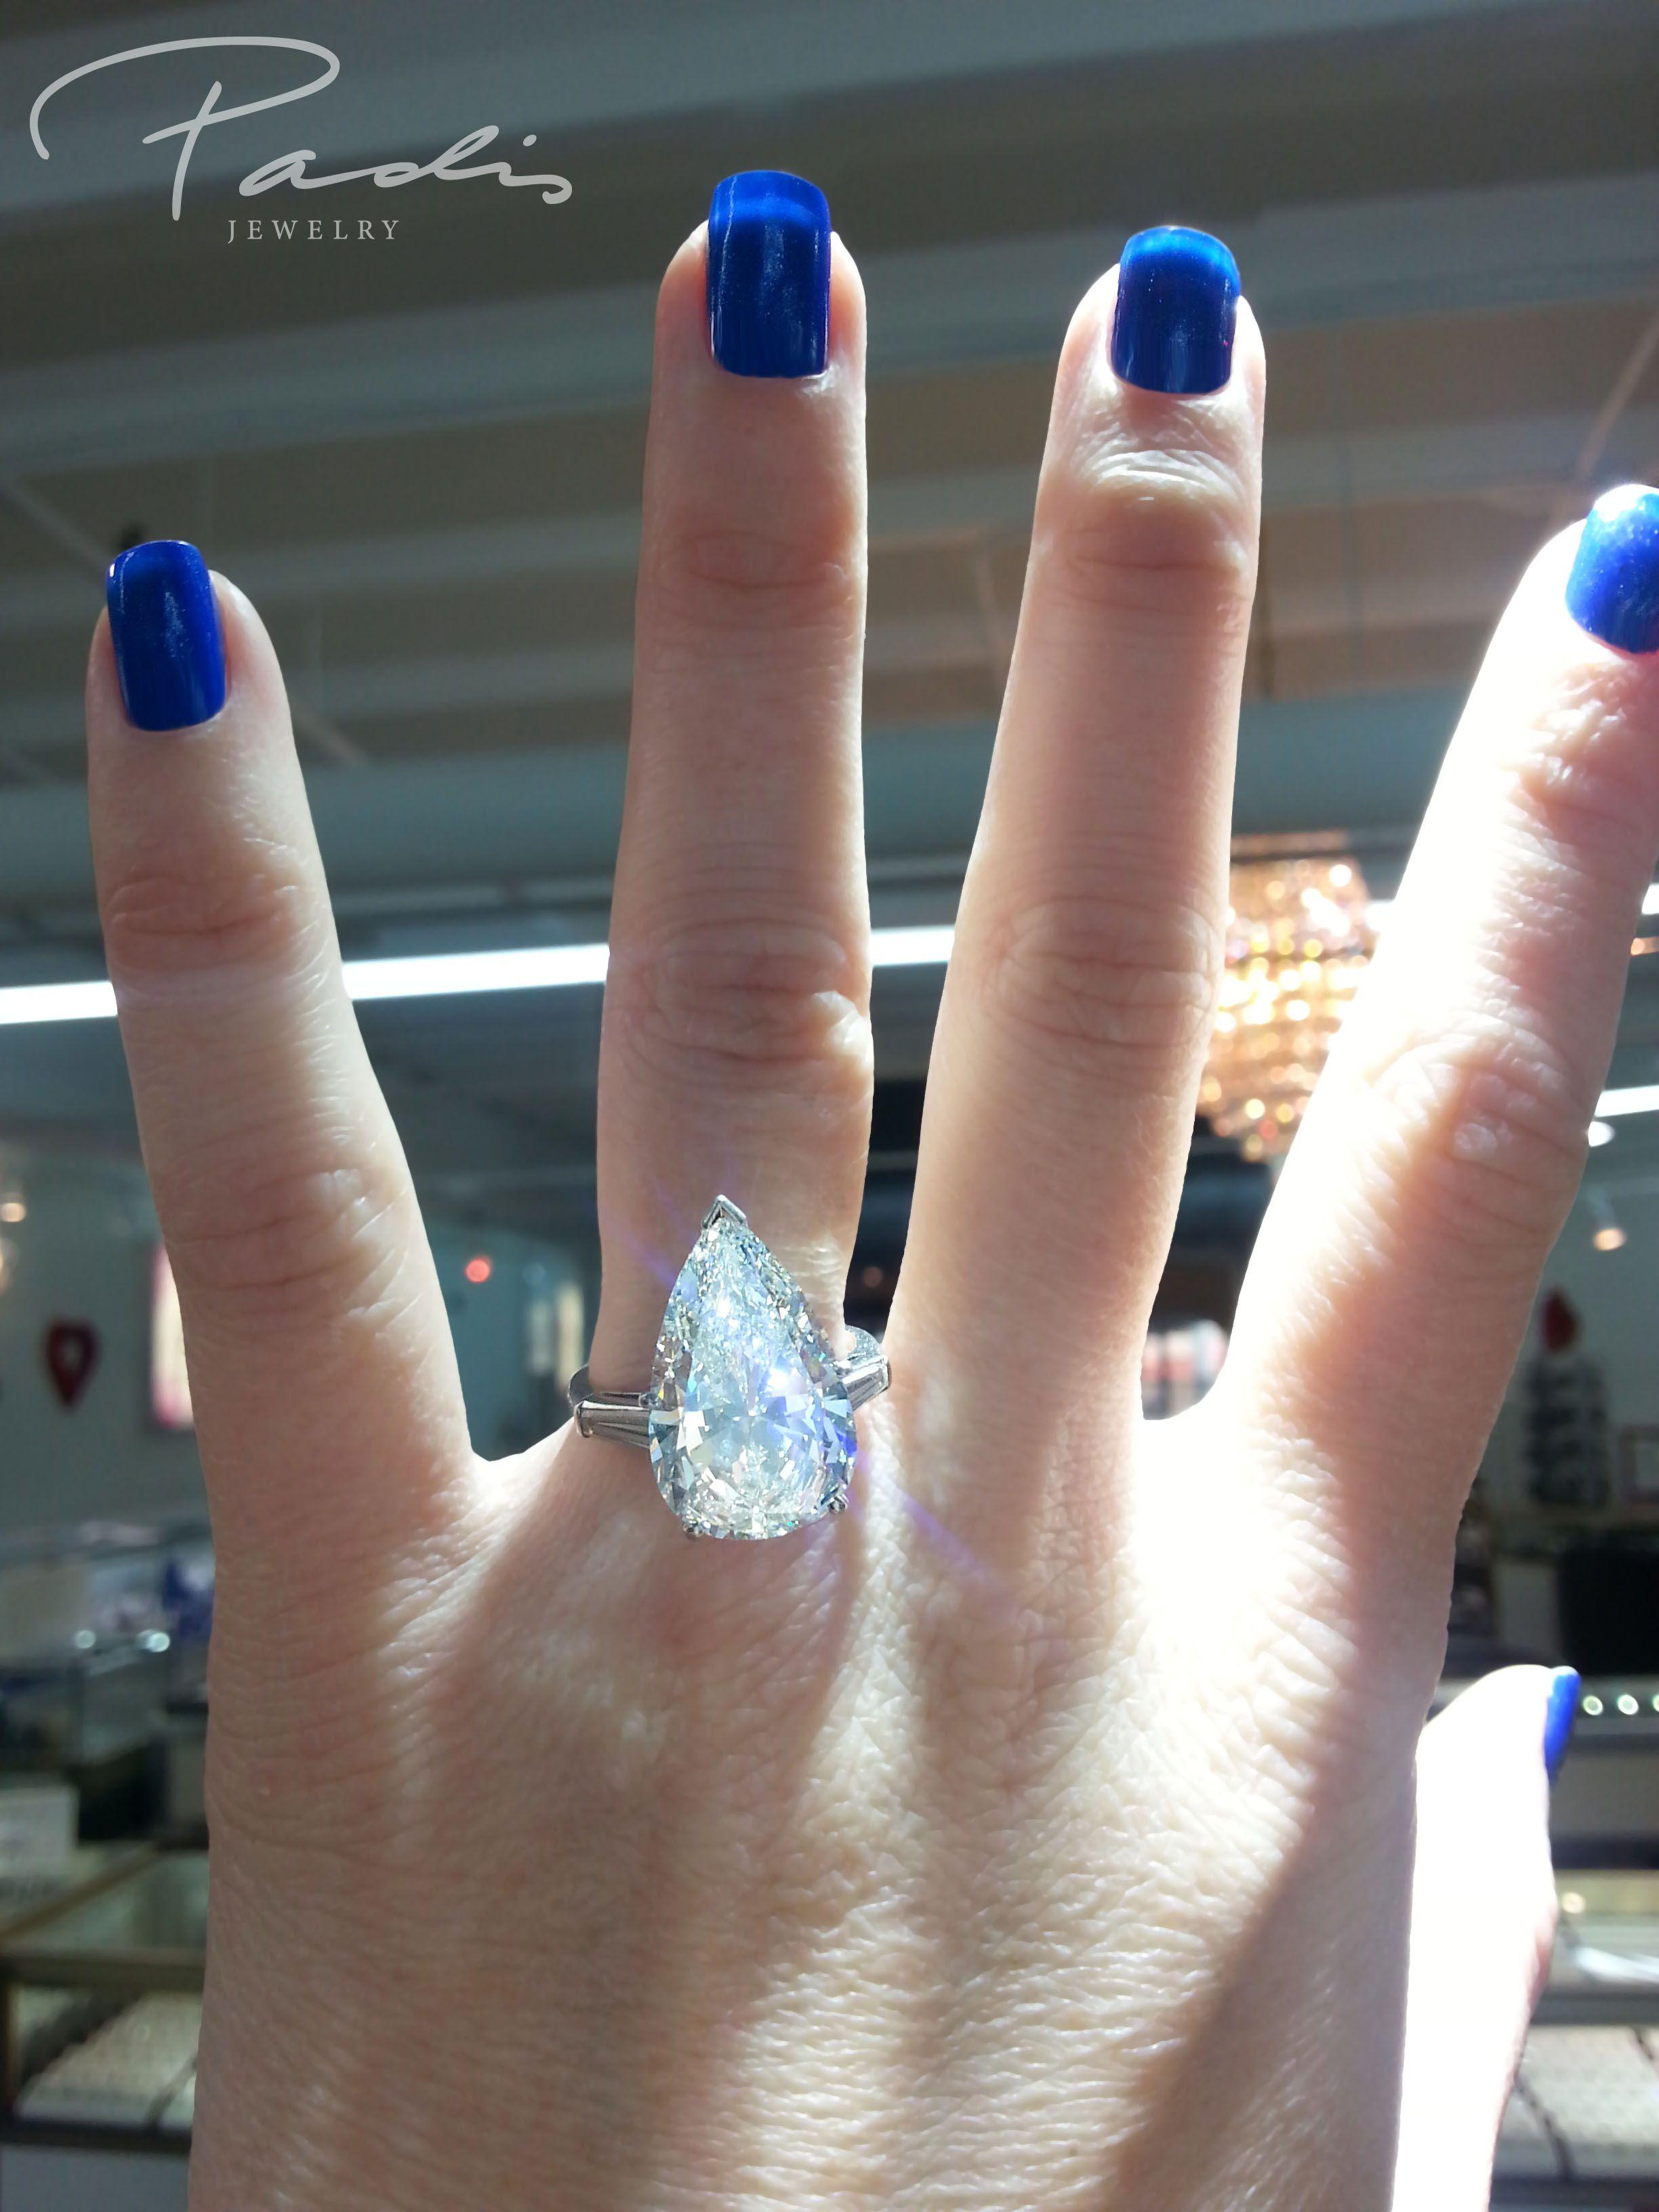 9 carat pear shaped diamond engagement ring